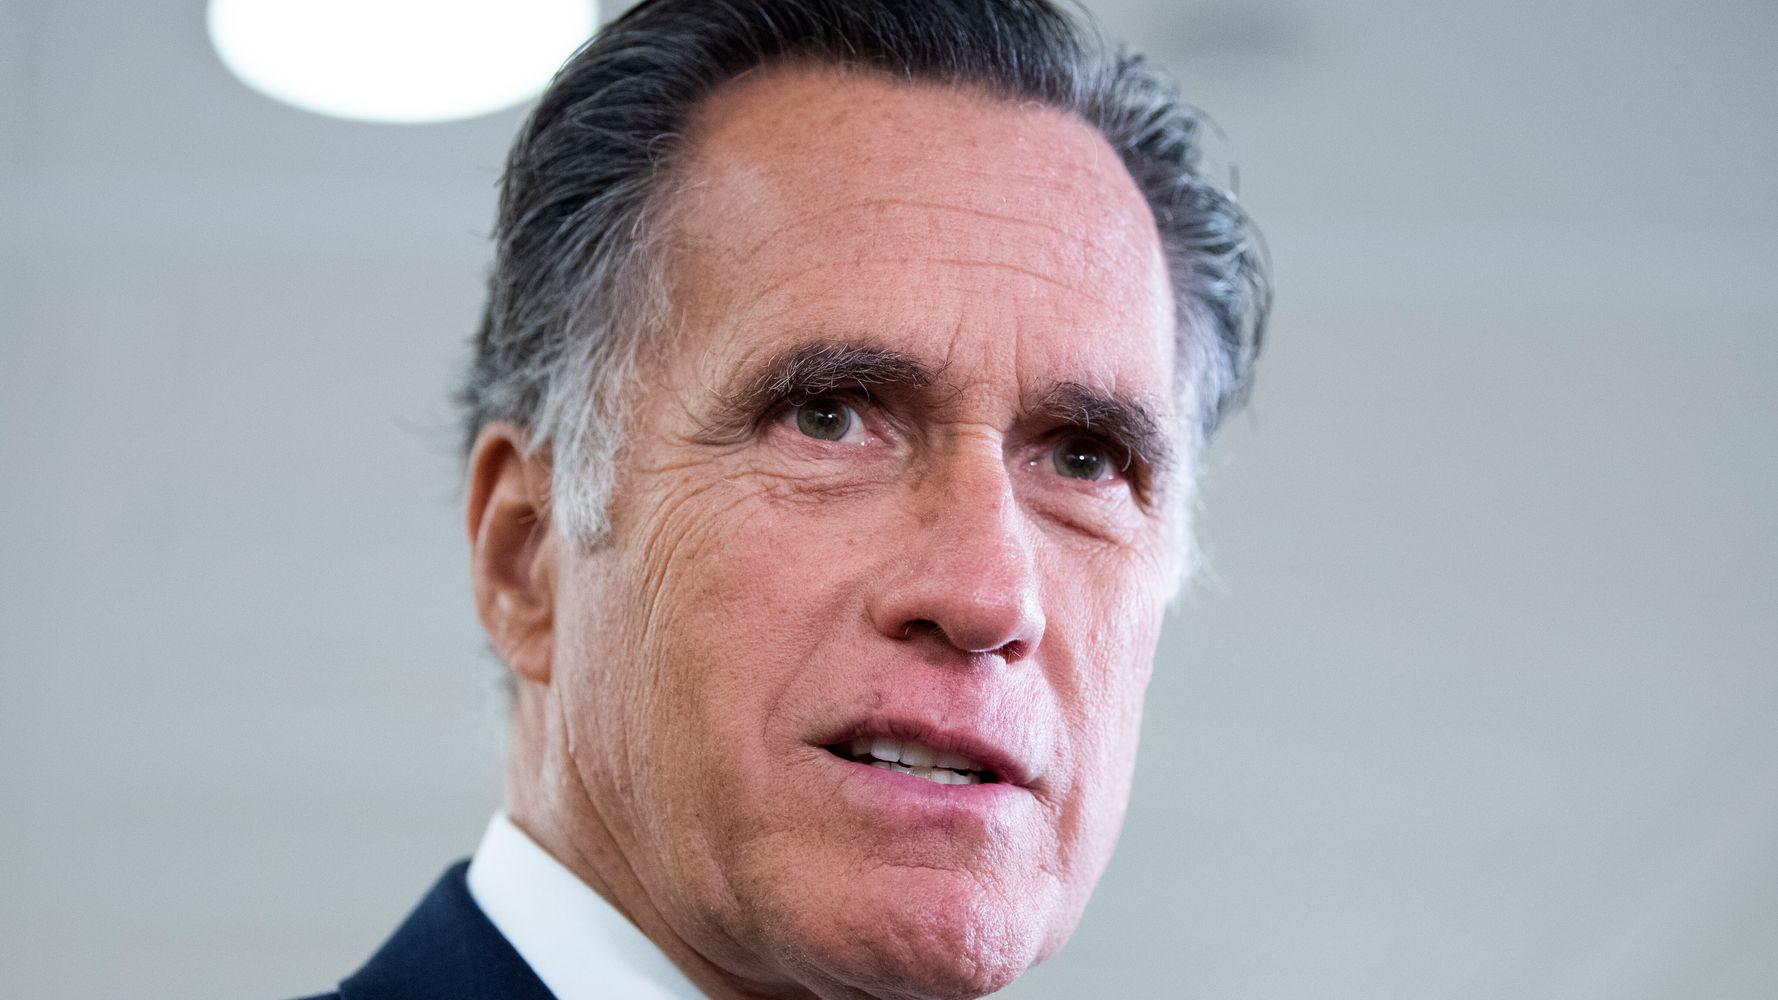 Mitt Romney Slams Tucker Carlson's Meeting With Hungary Strongman Viktor Orban